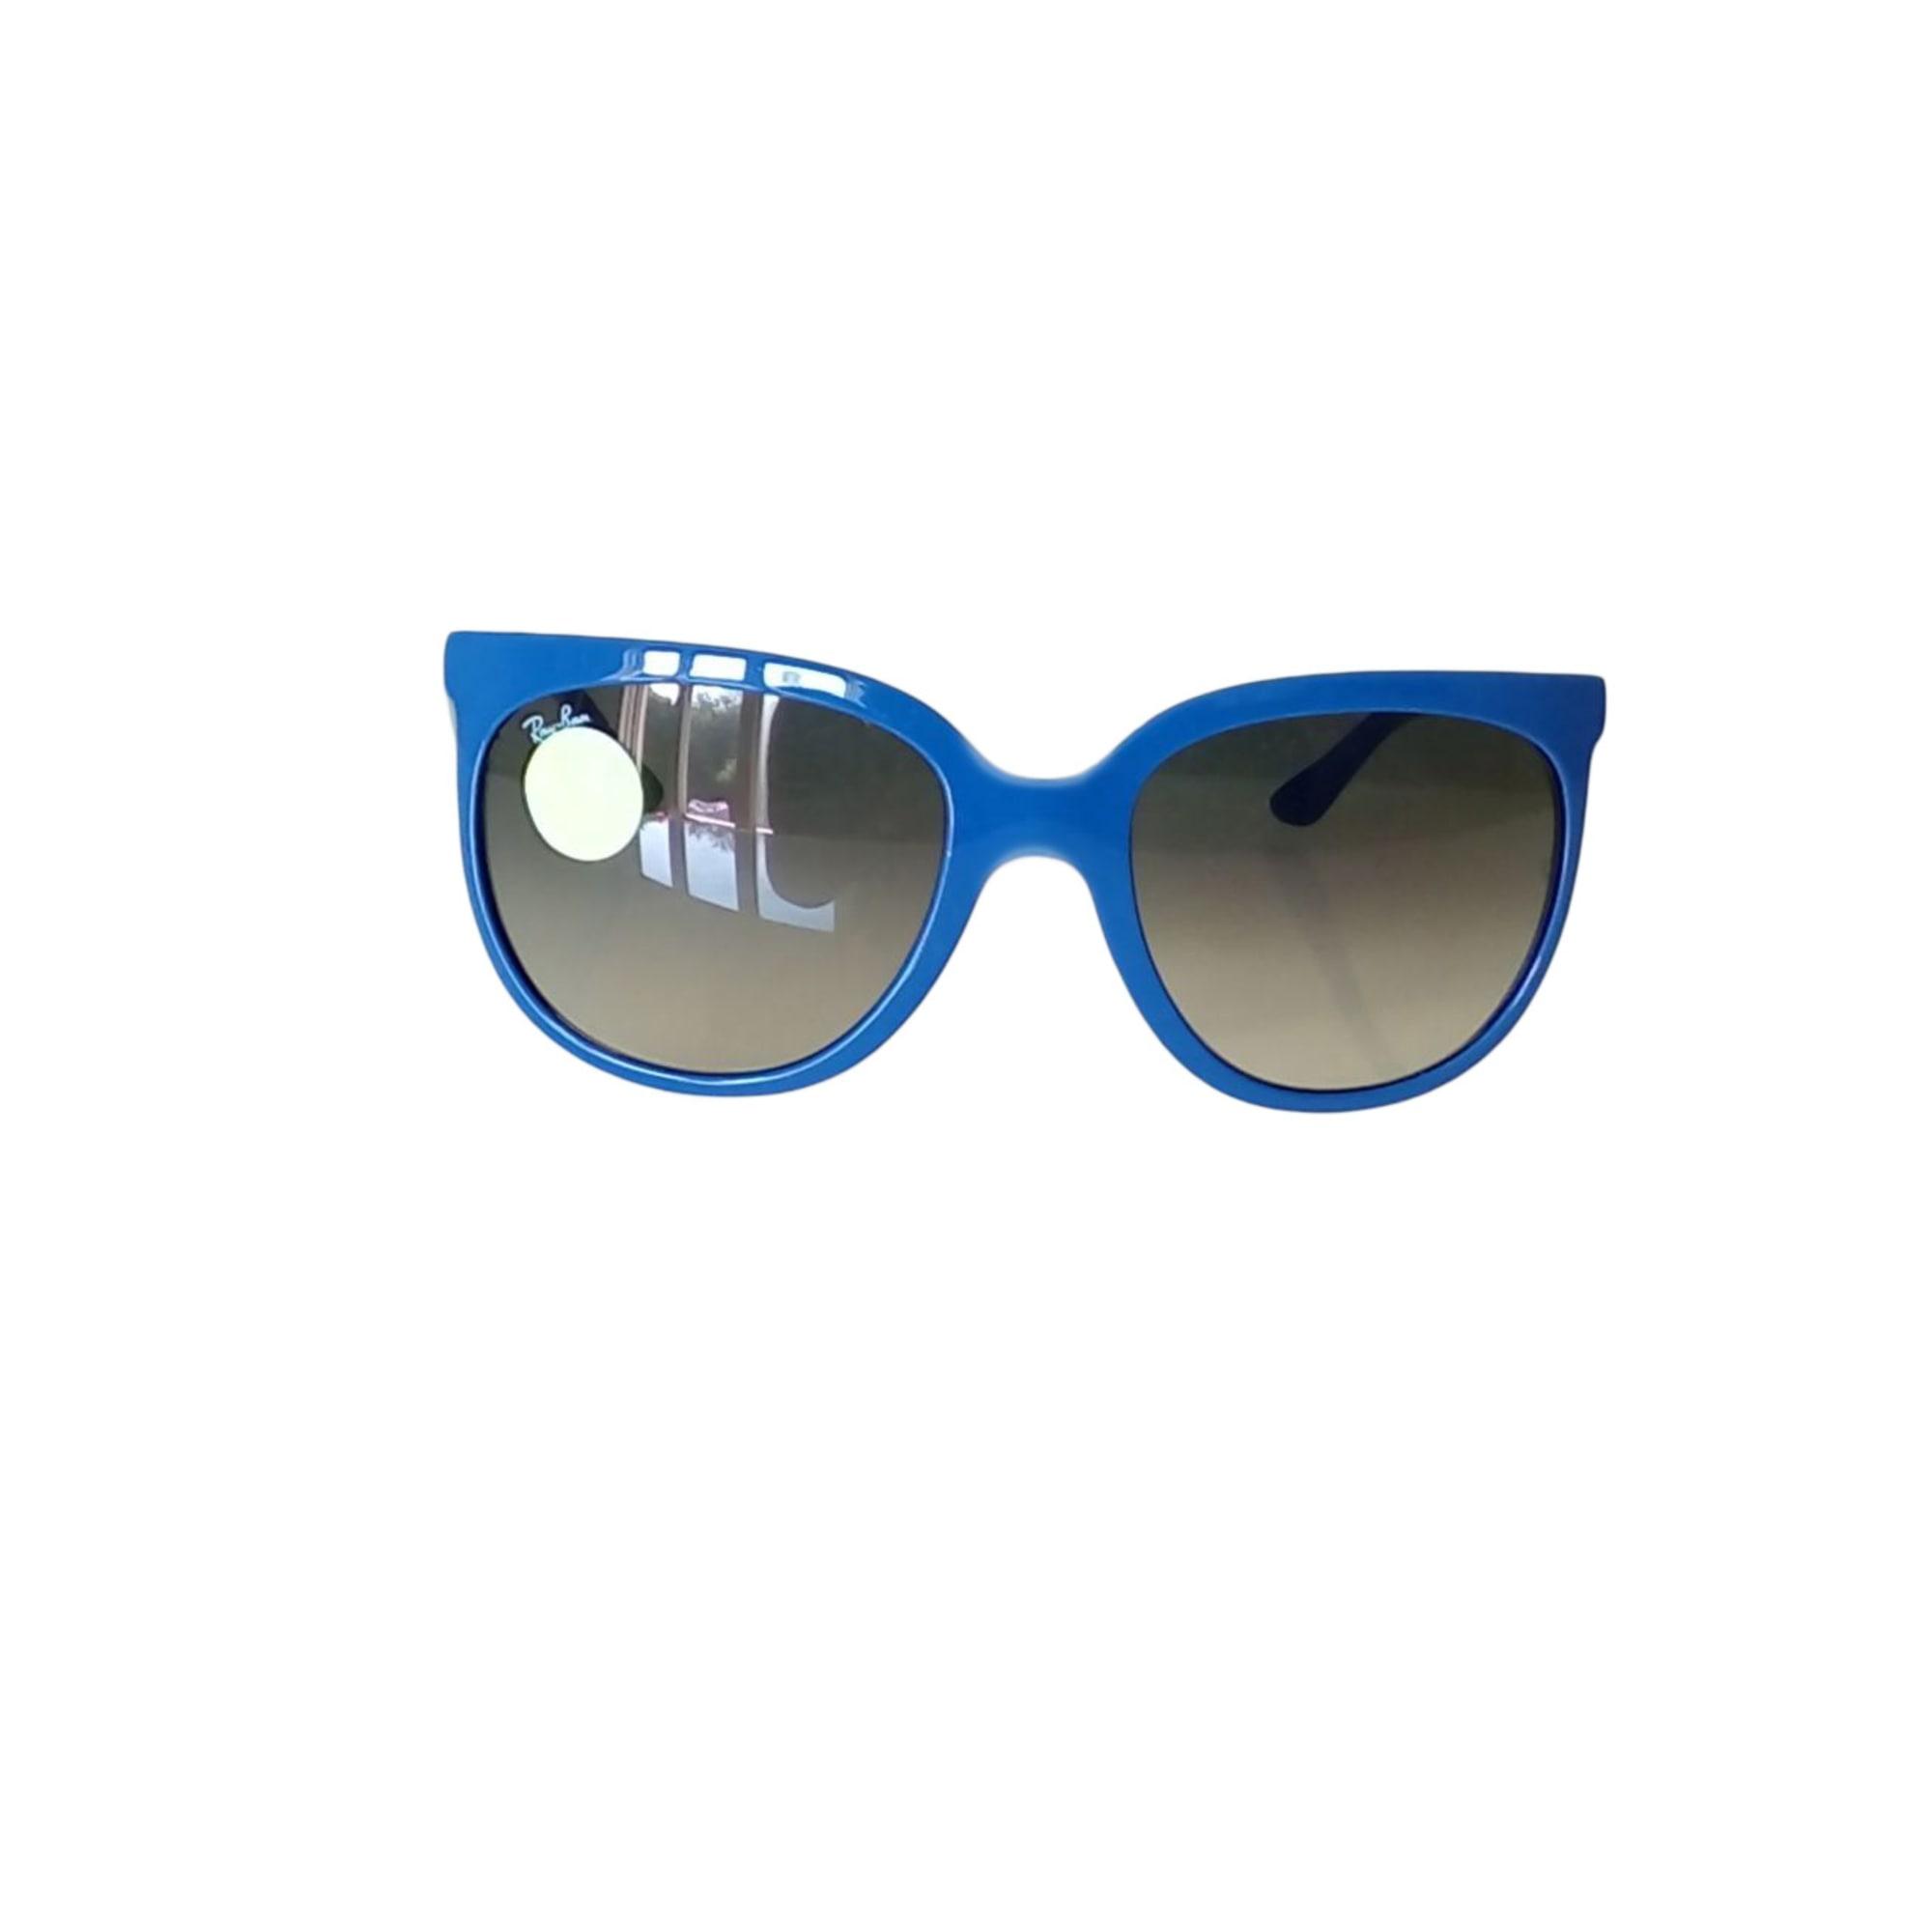 Lunettes de soleil RAY-BAN Bleu, bleu marine, bleu turquoise 67740be2f901